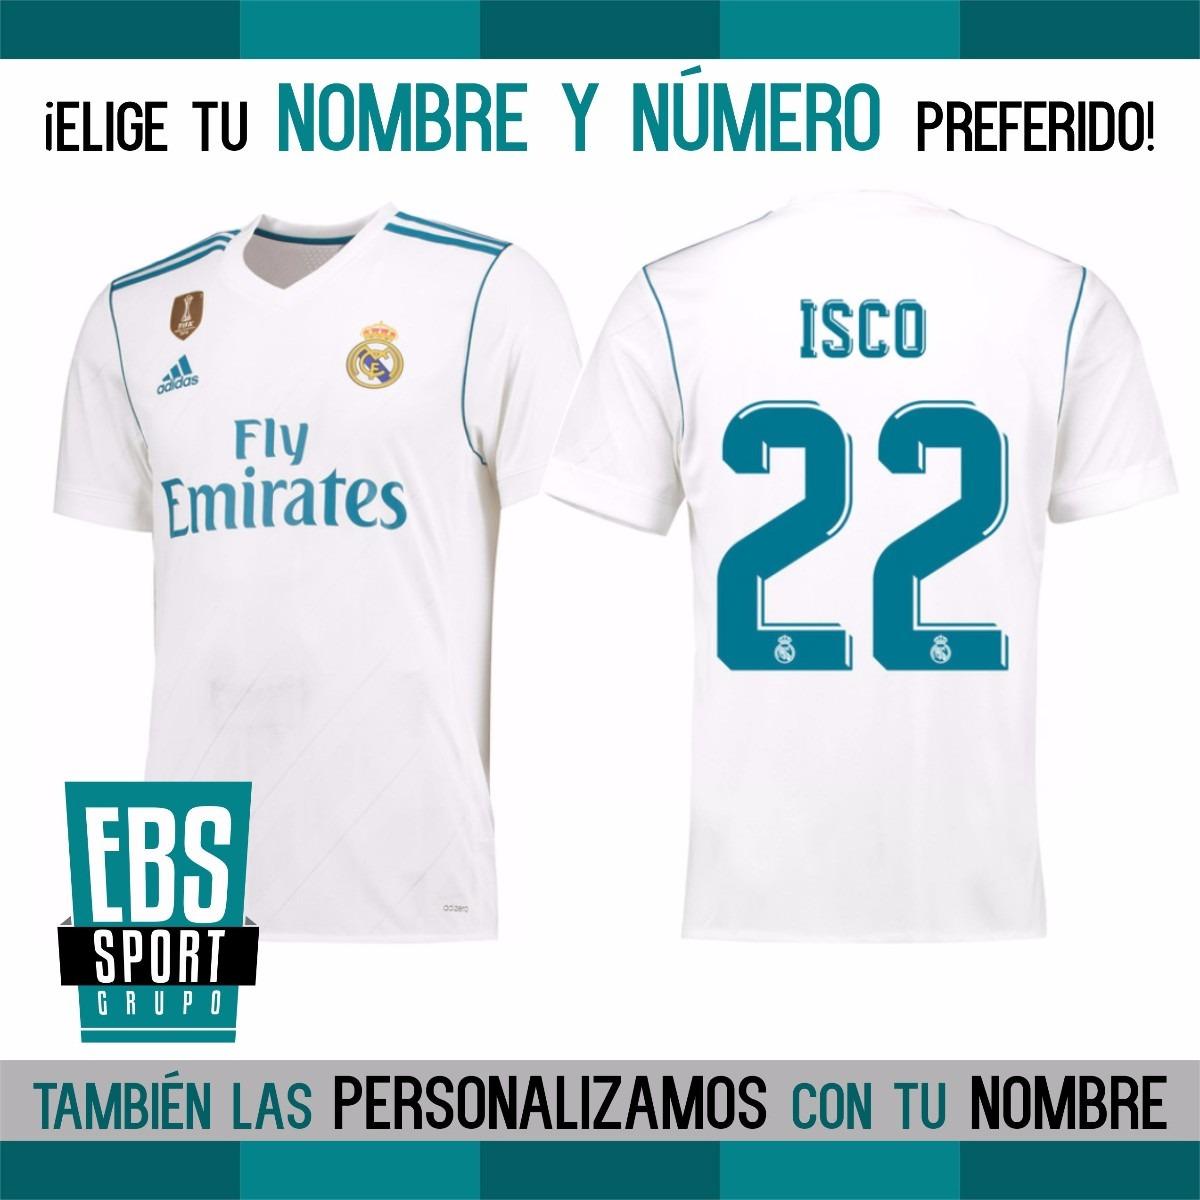 e8f4ab078ce9a camiseta real madrid 2018 adidas personalizada con tu nombre. Cargando zoom.